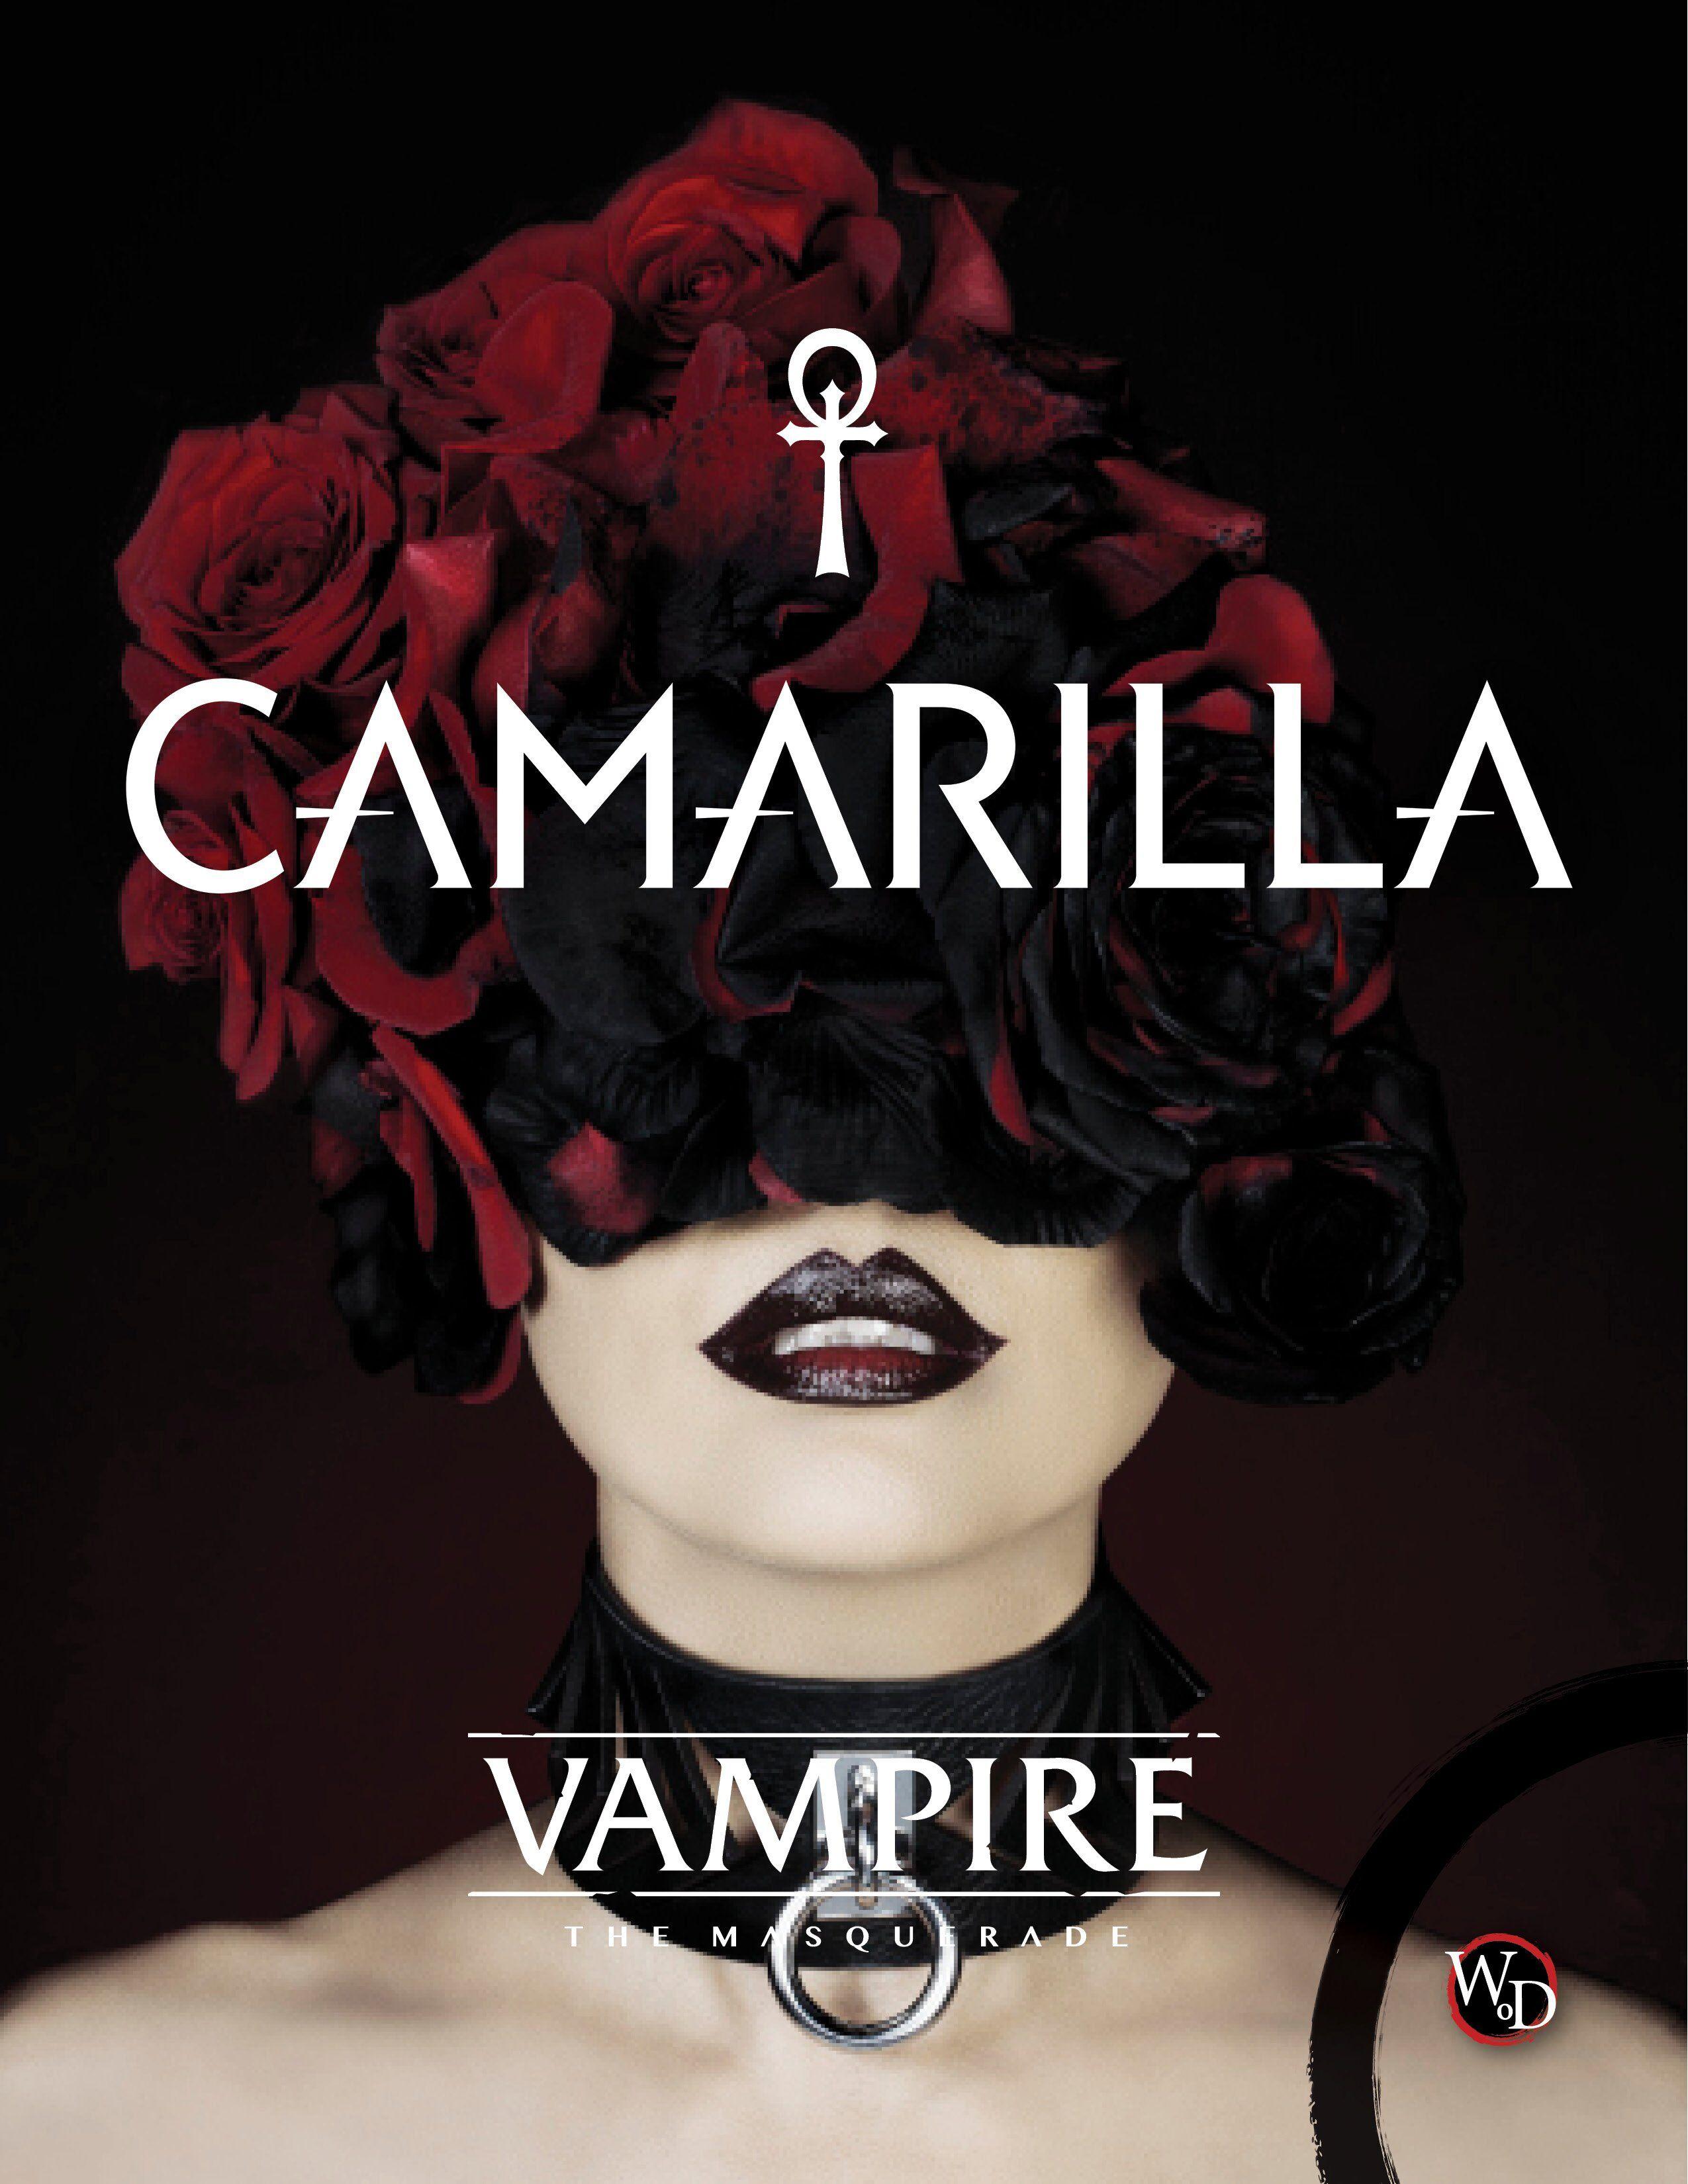 Vampire Masquerade Camarilla (Hardback) 5th Edition - Source Book